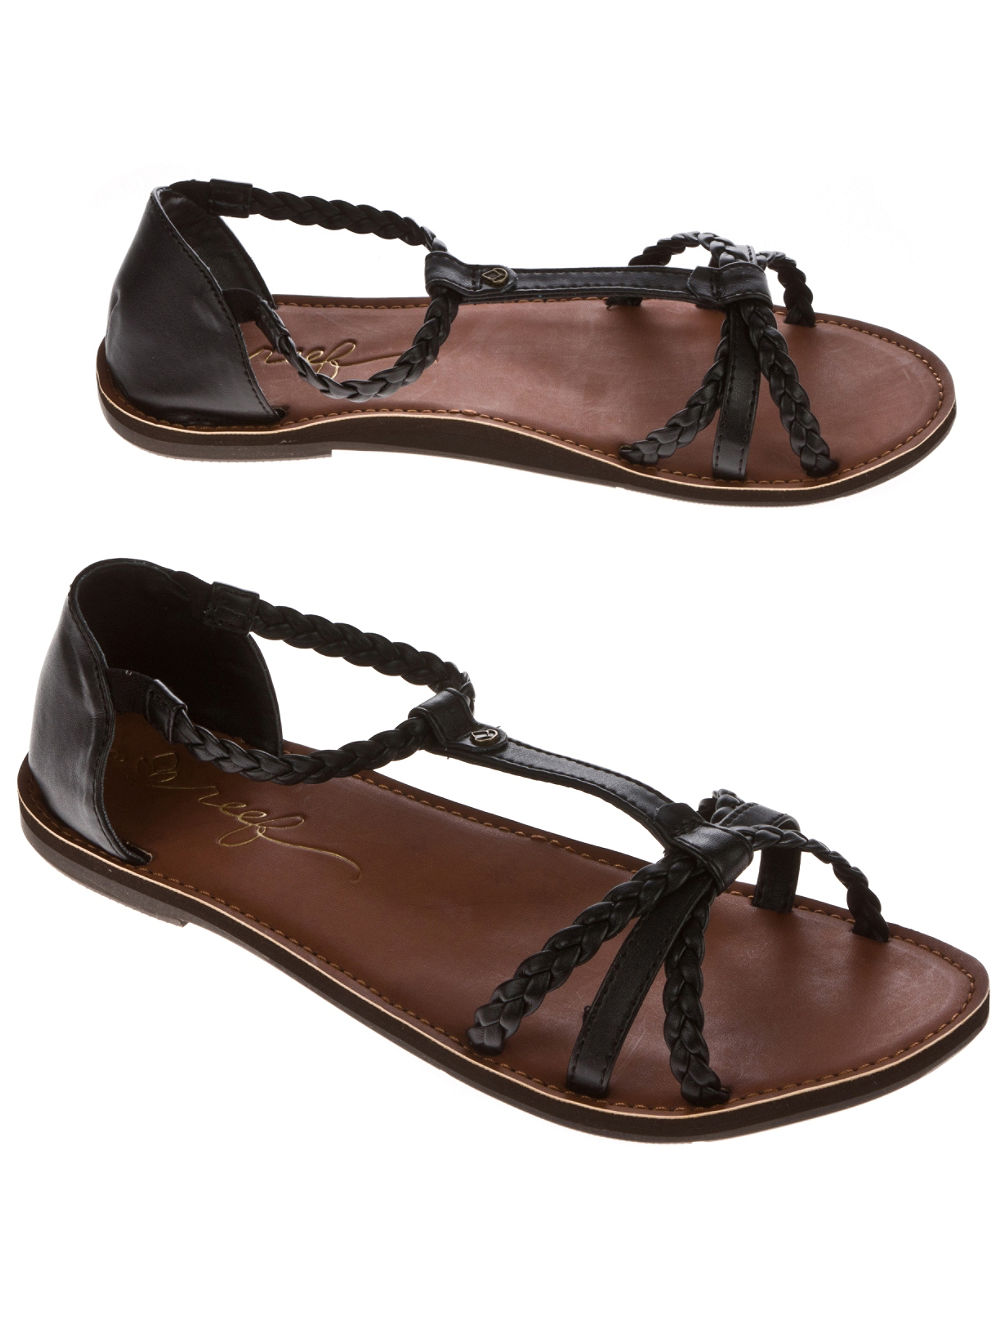 reef-reef-naomi-sandals-women